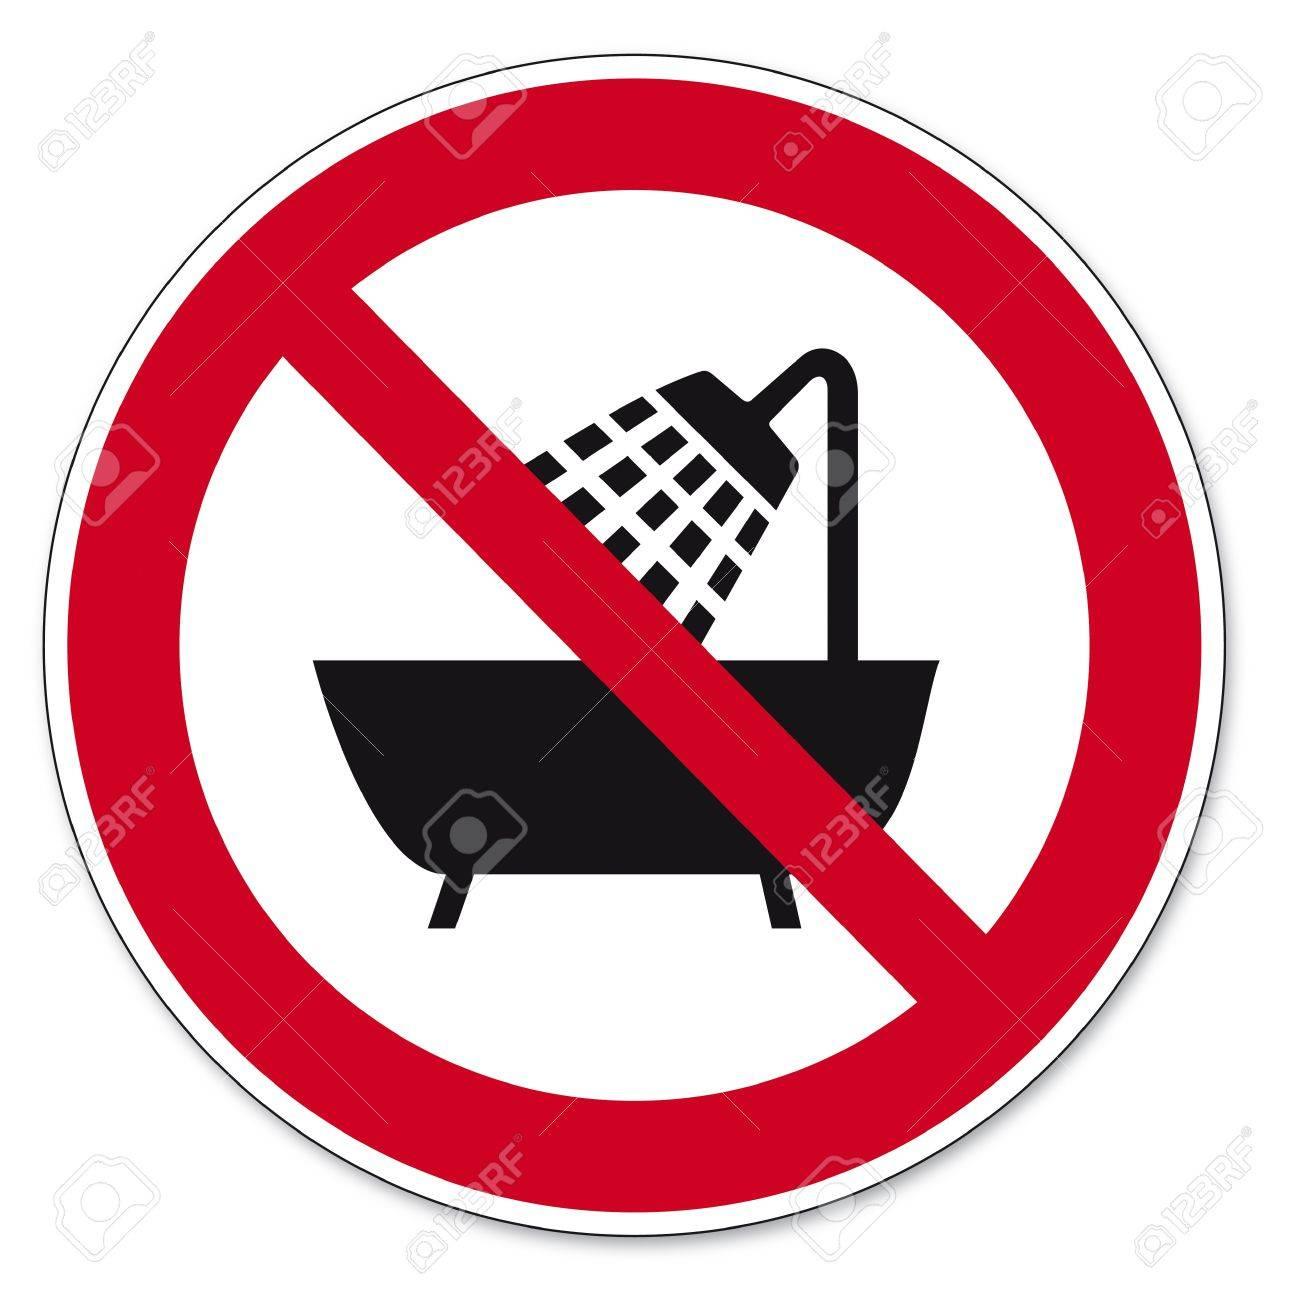 Prohibition signs BGV icon pictogram Device use in the bathtub Stock Vector - 14492210